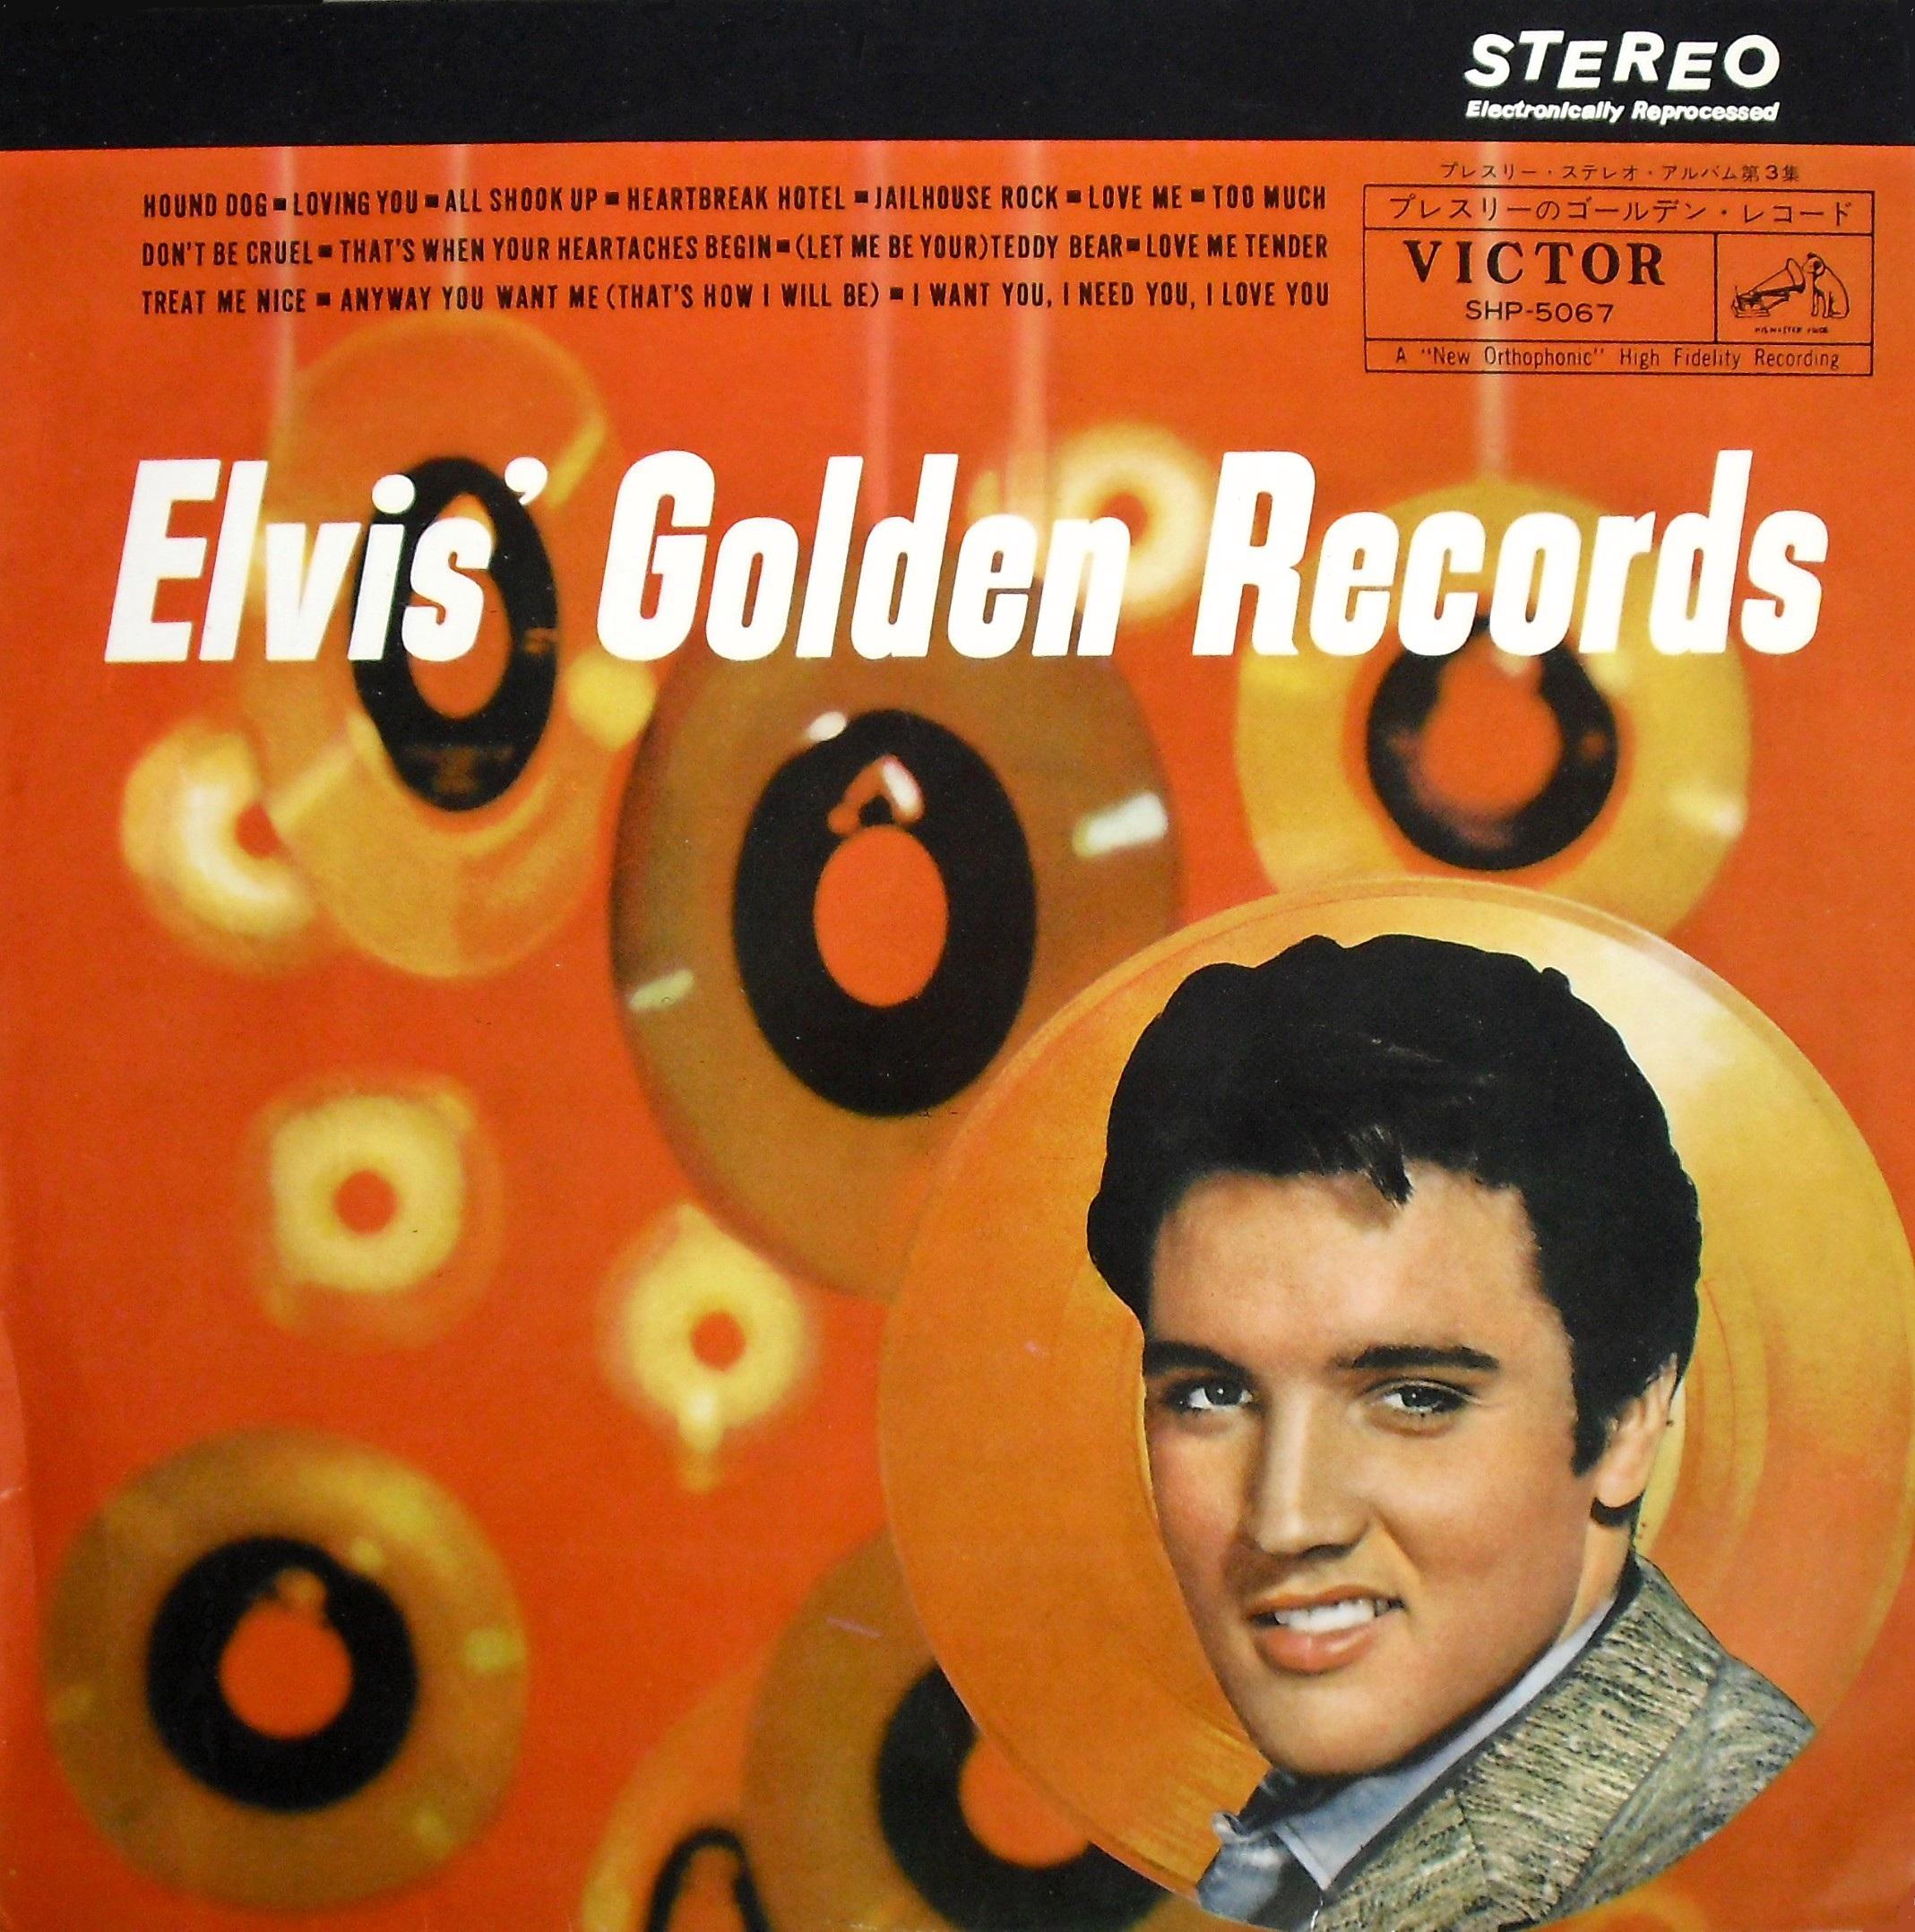 ELVIS`GOLDEN RECORDS 01lsuzj